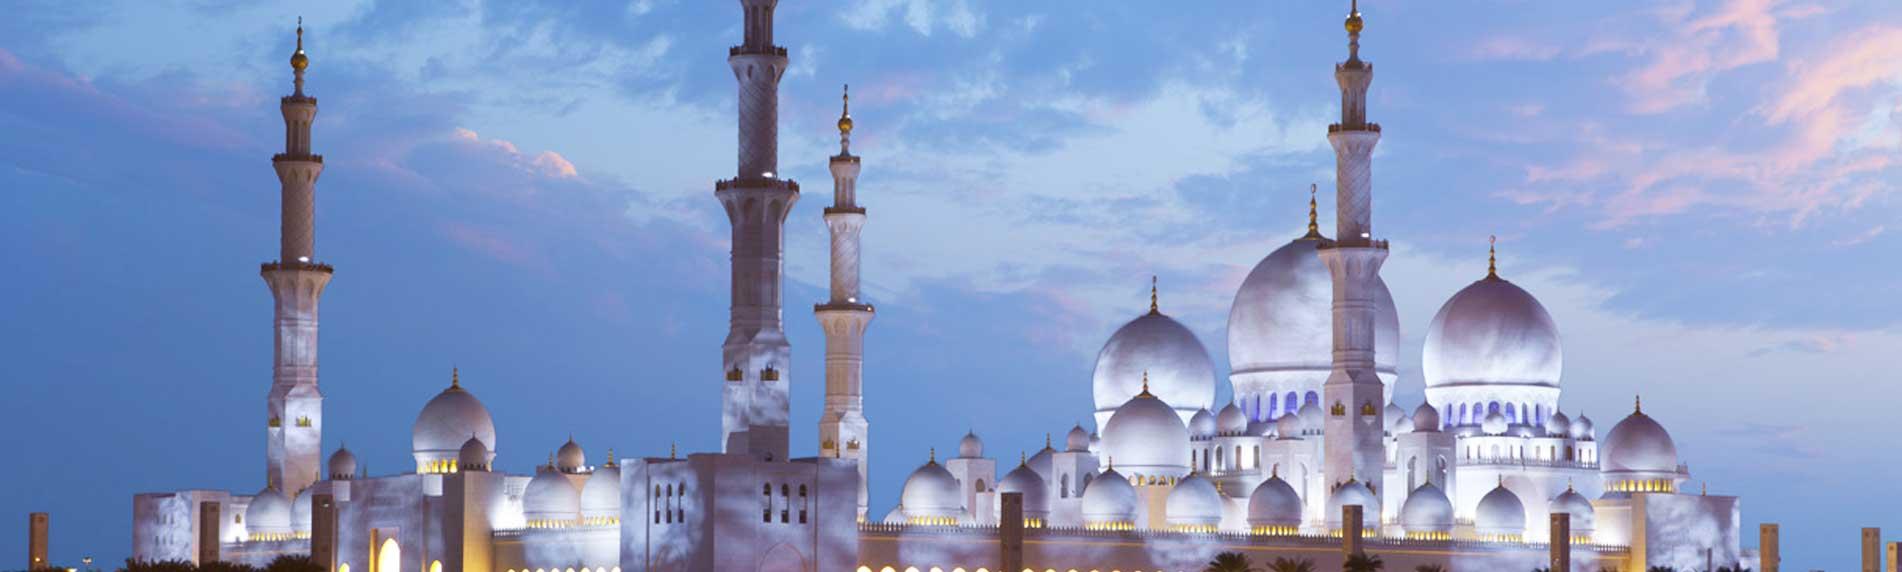 5 Nights 6 Days Dubai City Breaks